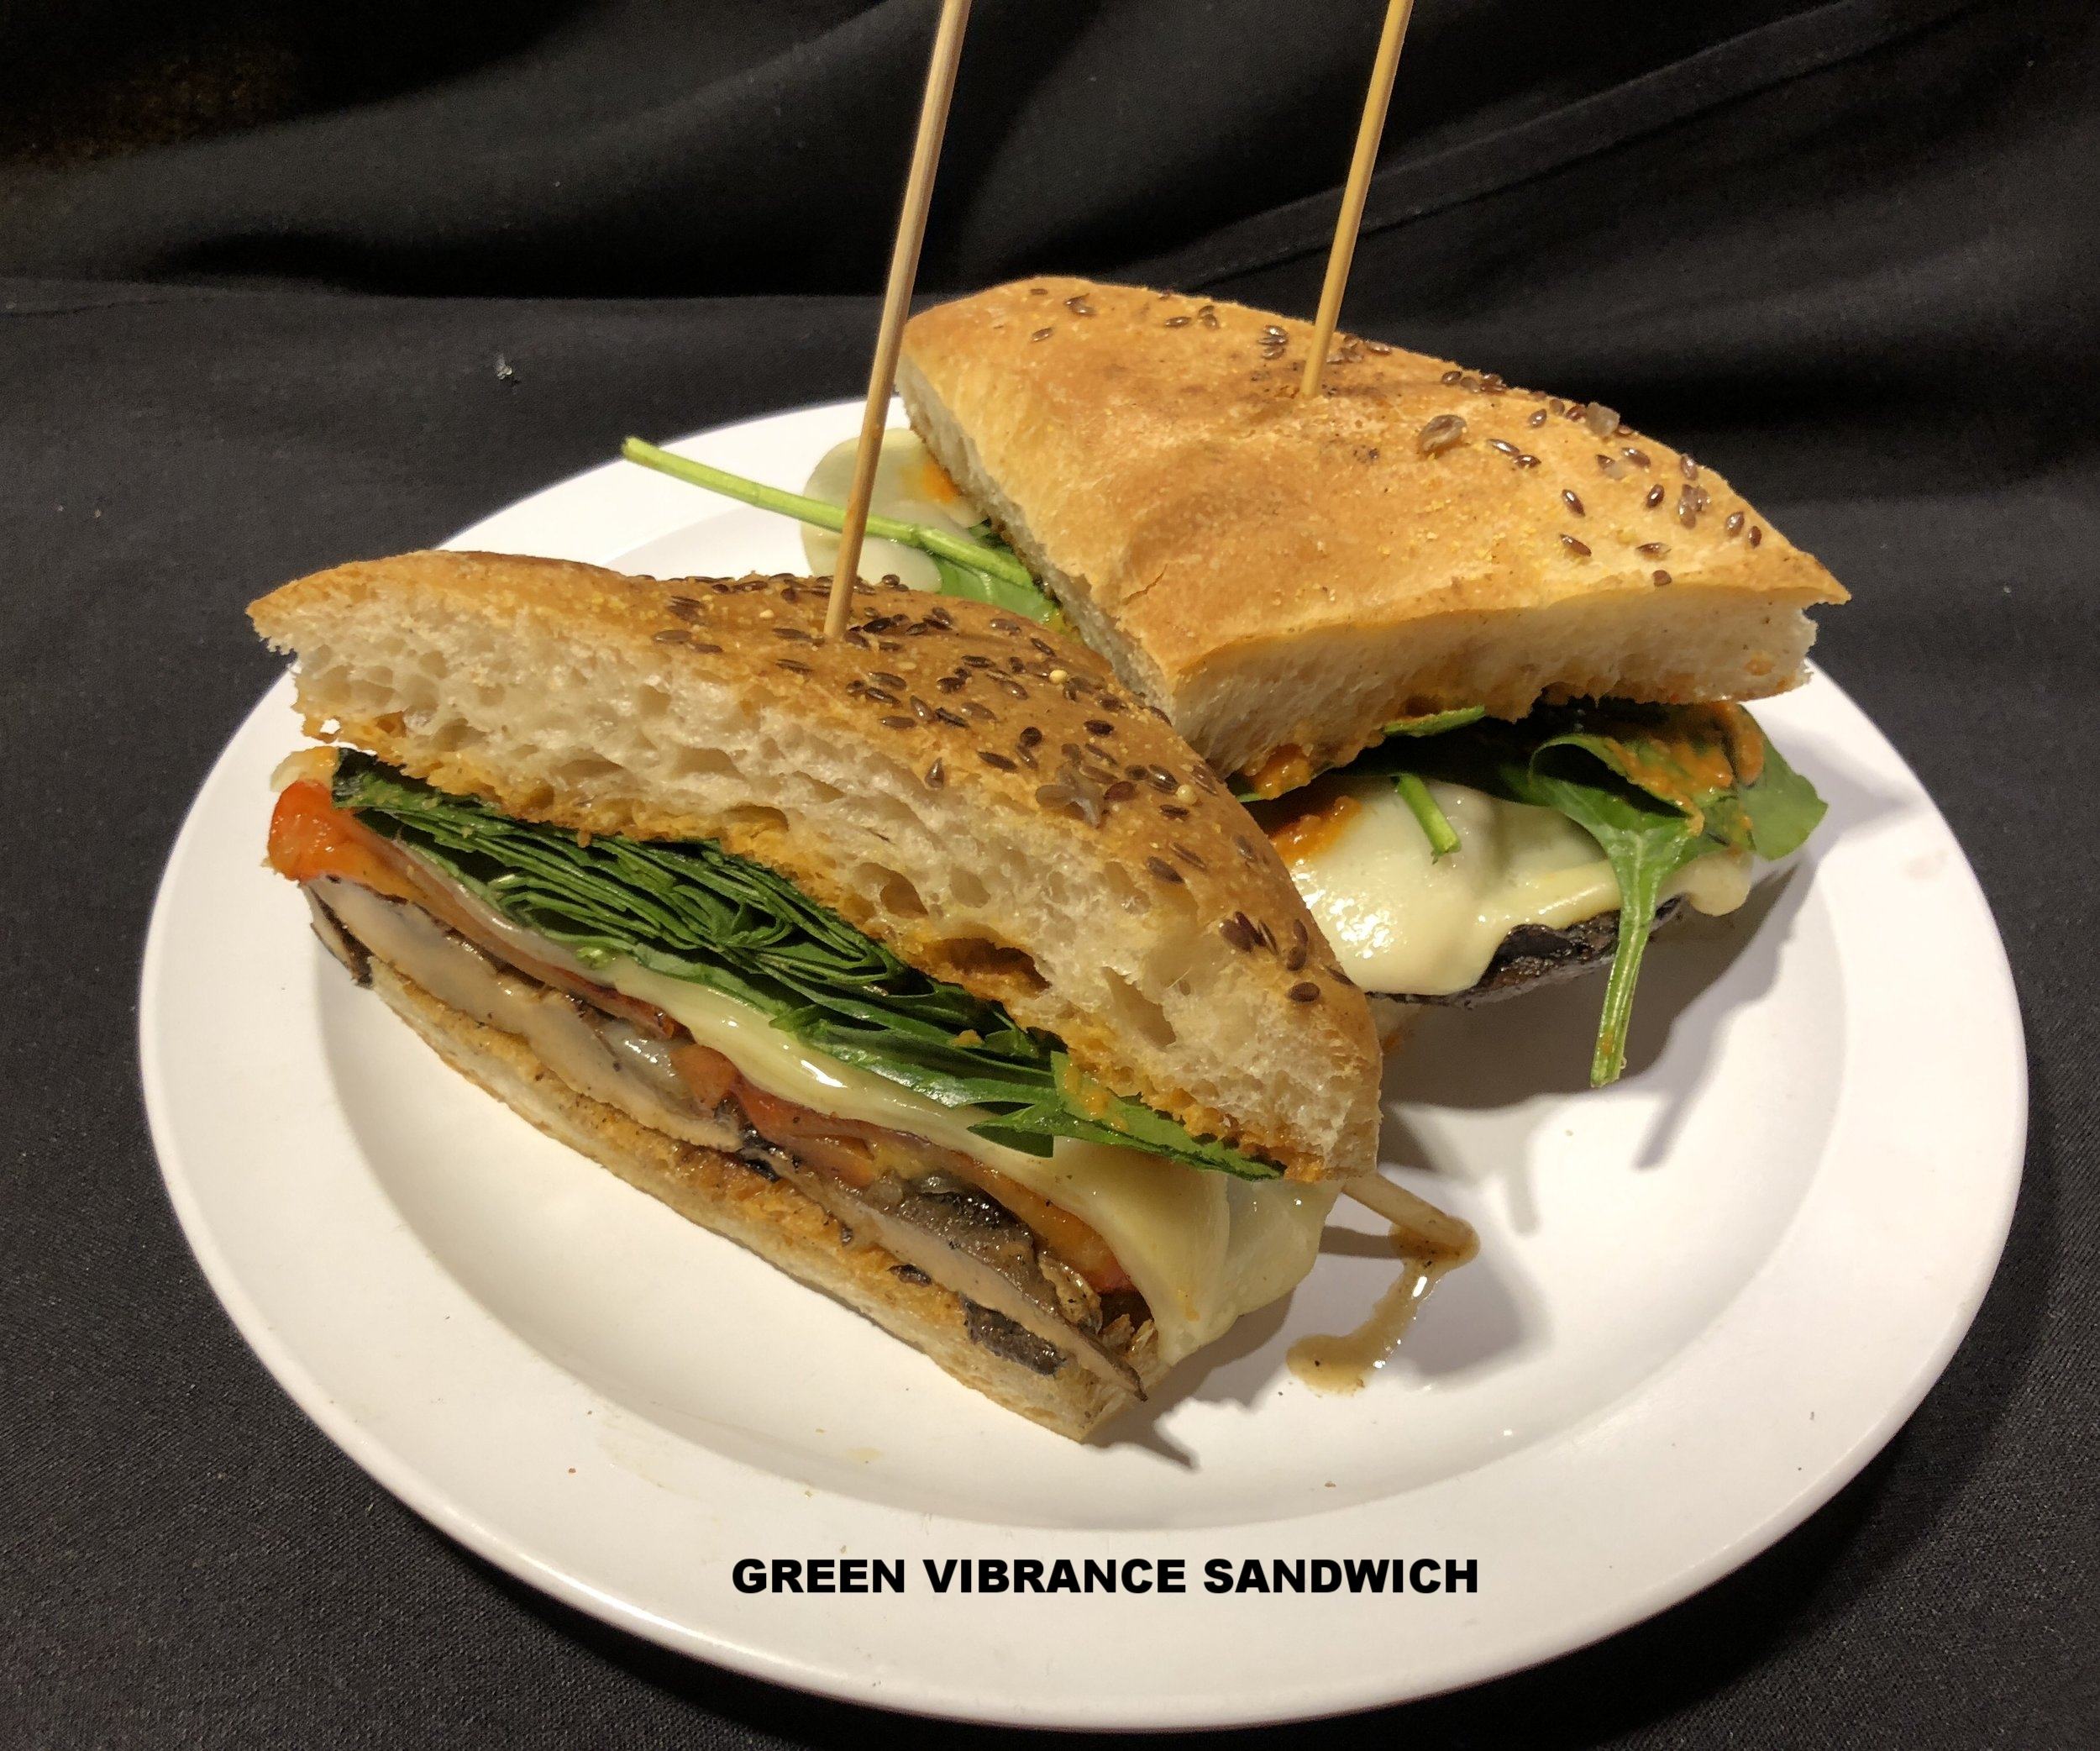 Green Vibrance Sandwich